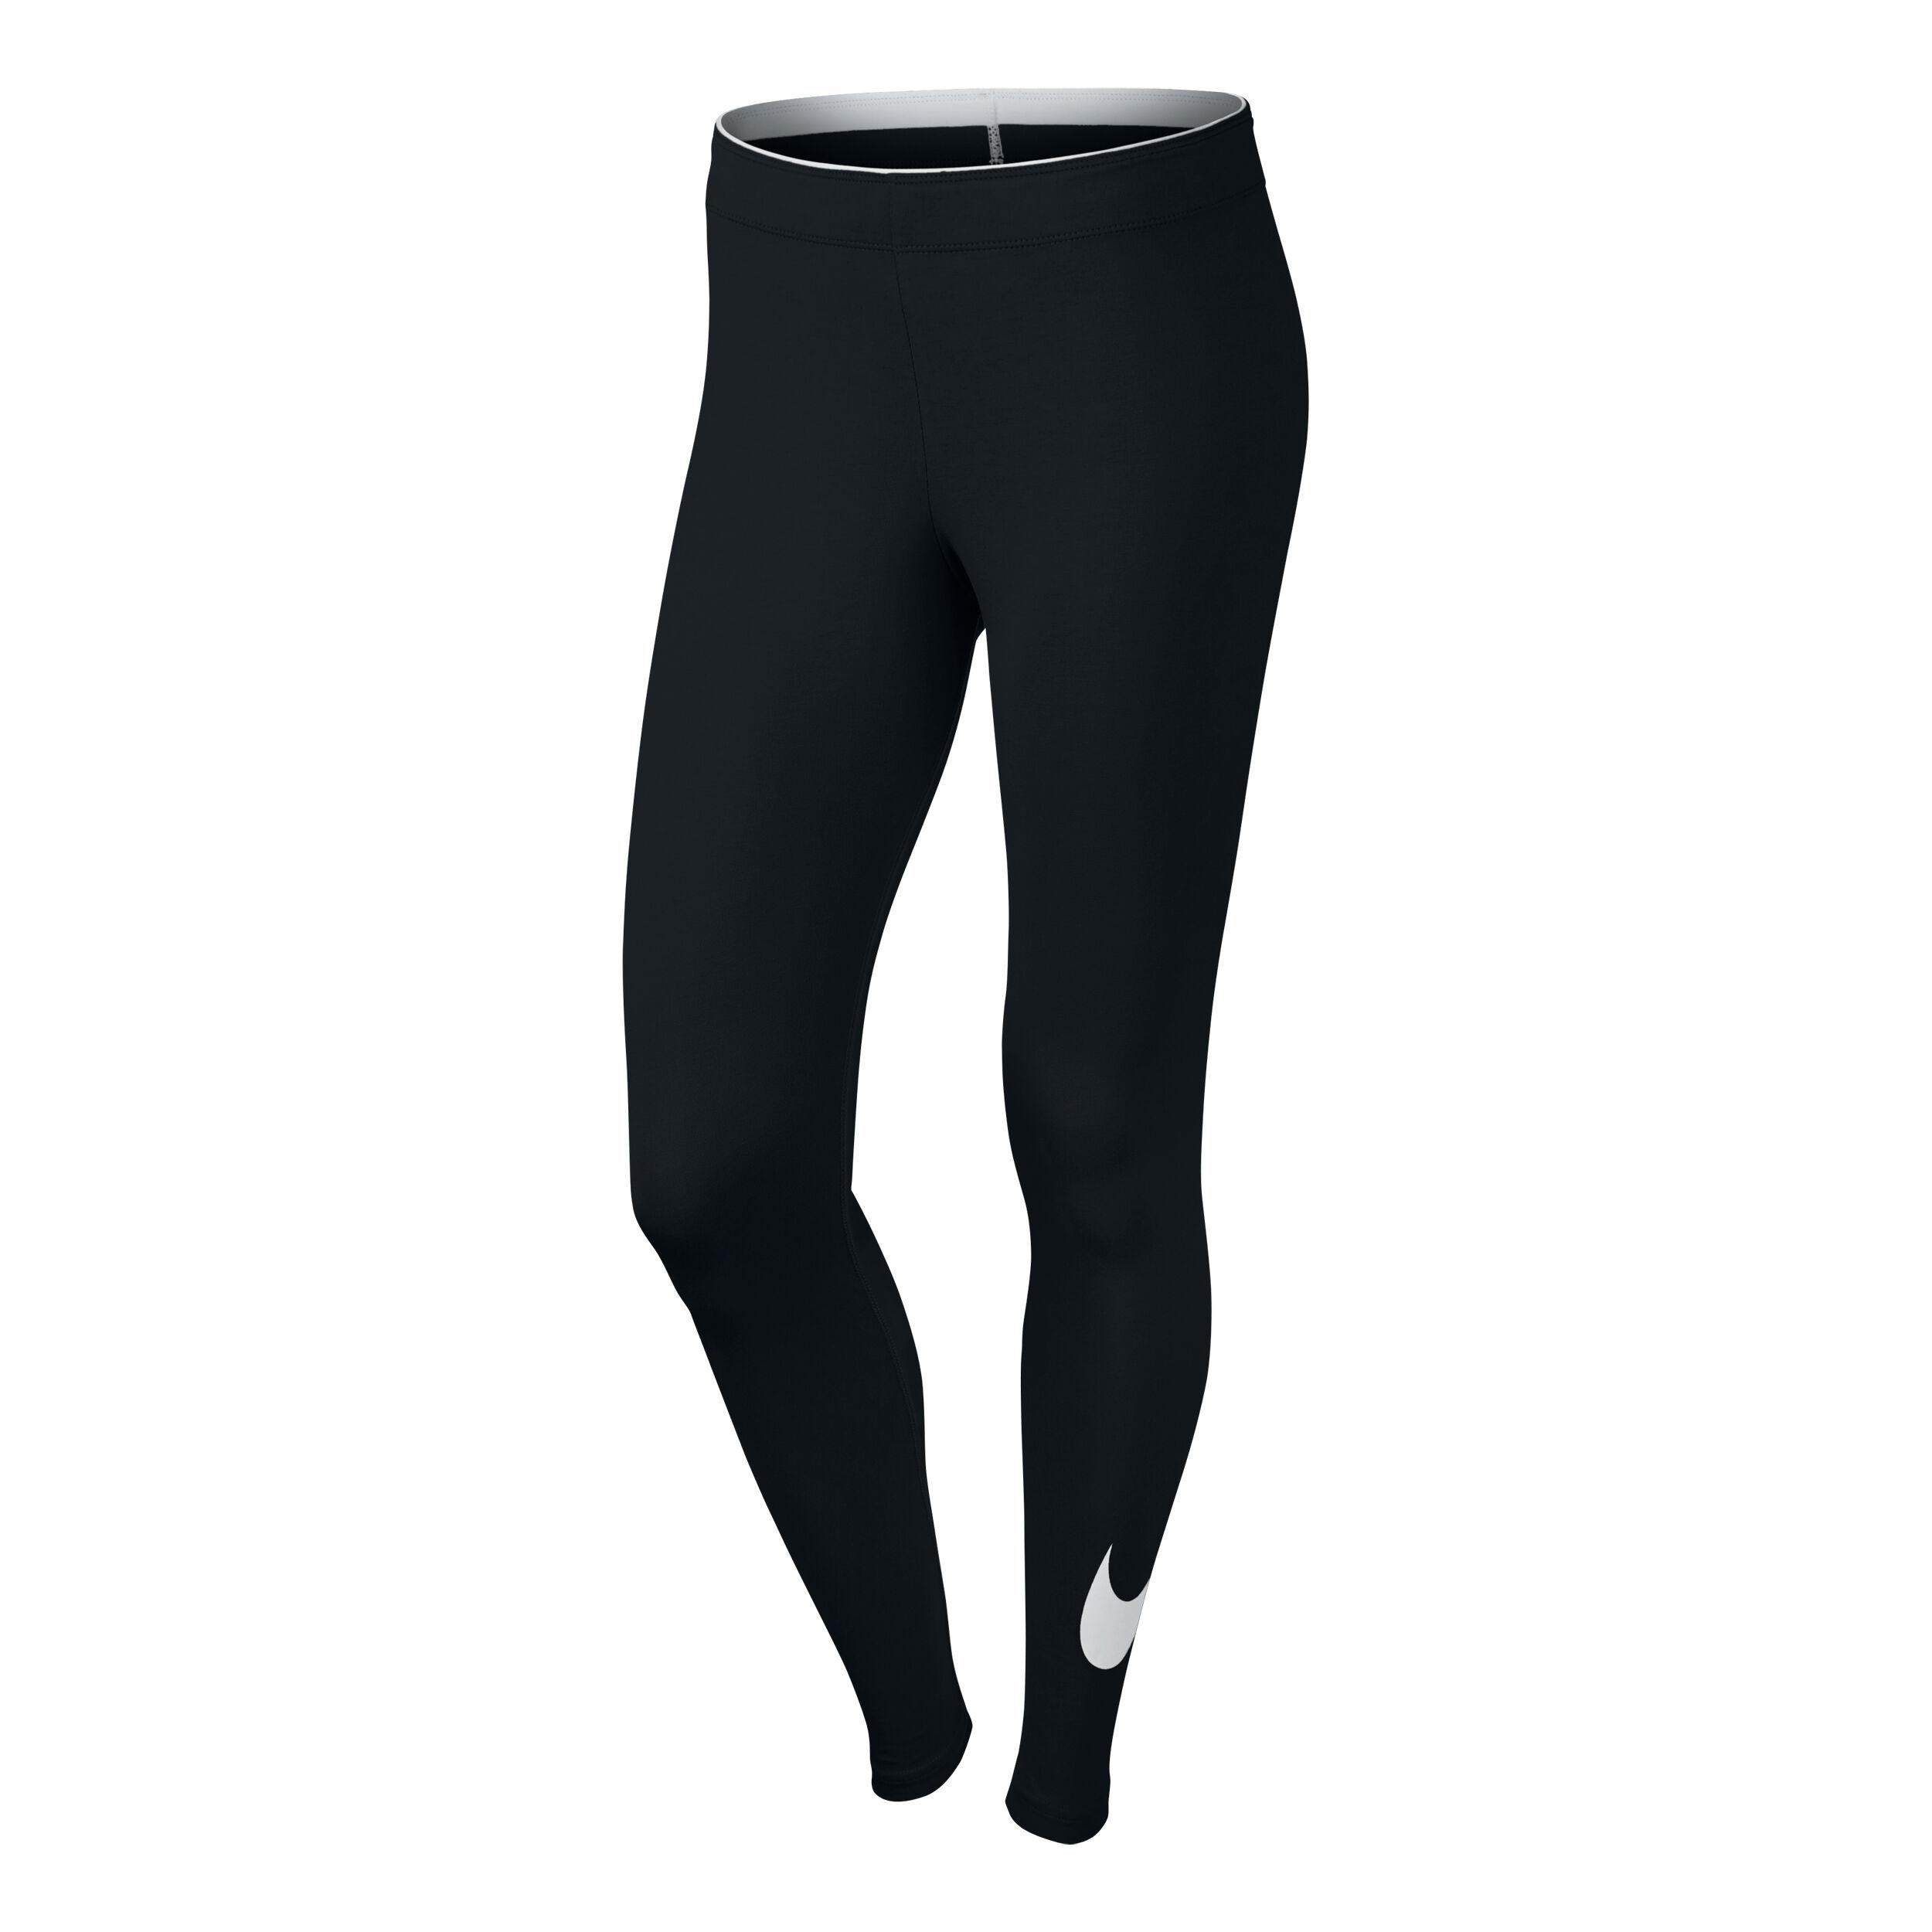 Sportswear Swoosh Tight Damen Schwarz, Weiß